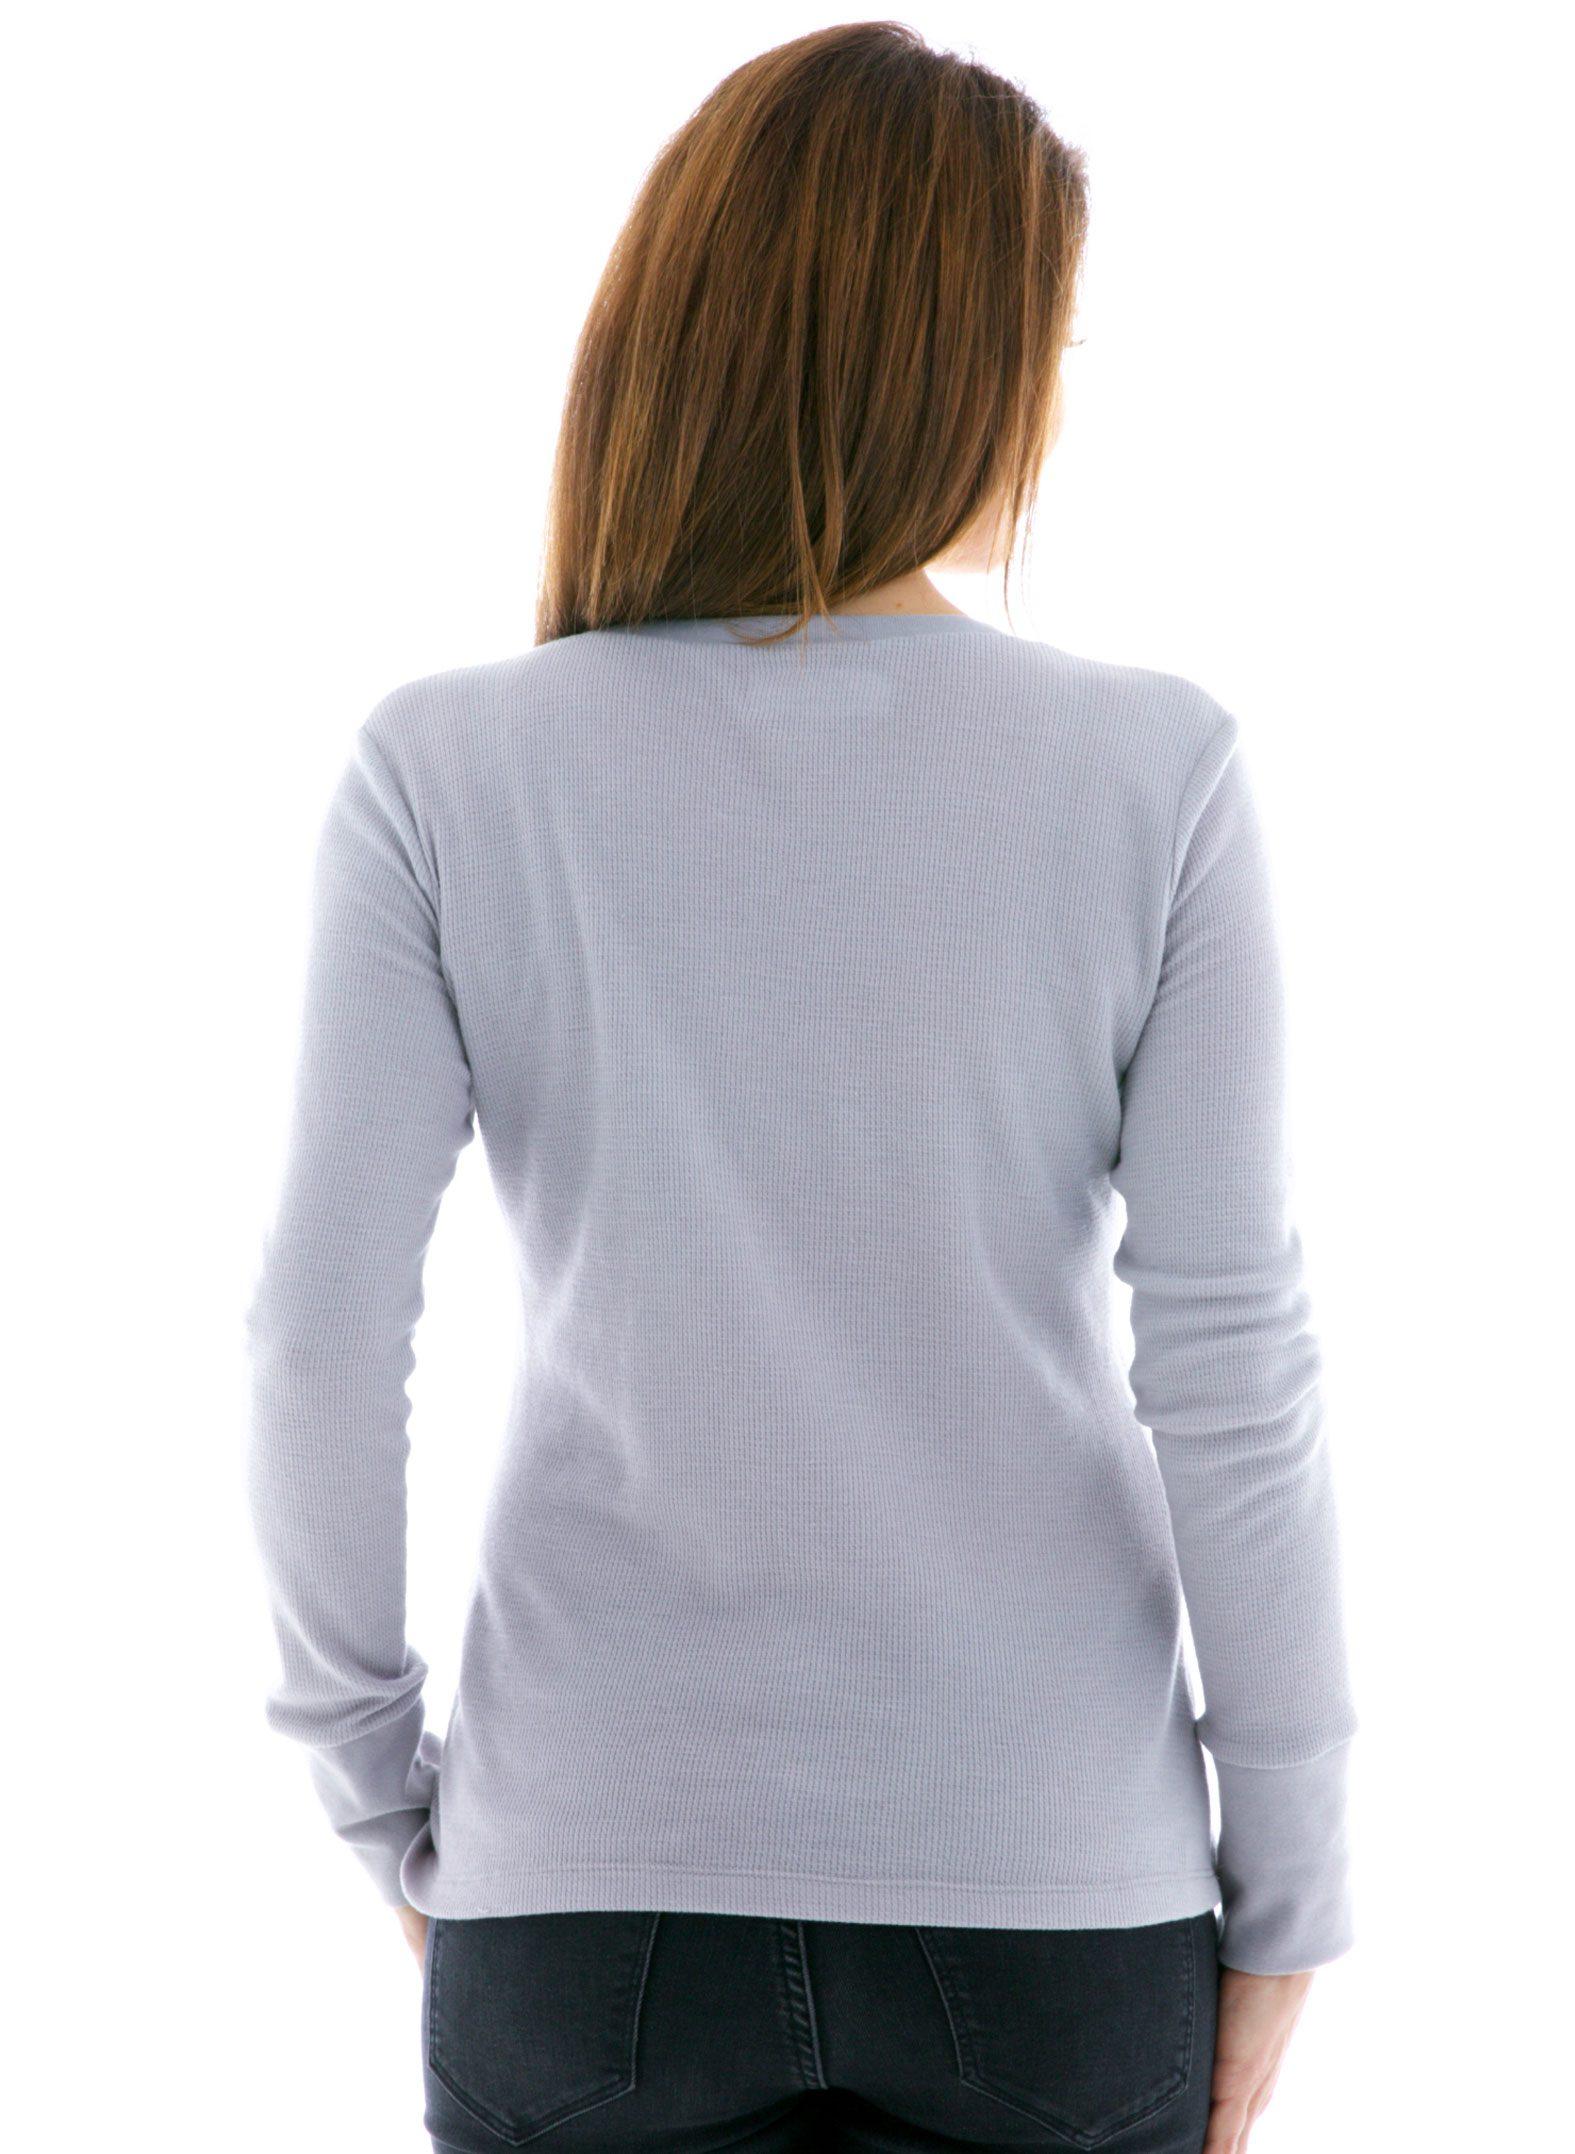 Women's Vintage Long Sleeve Thermal T-Shirt